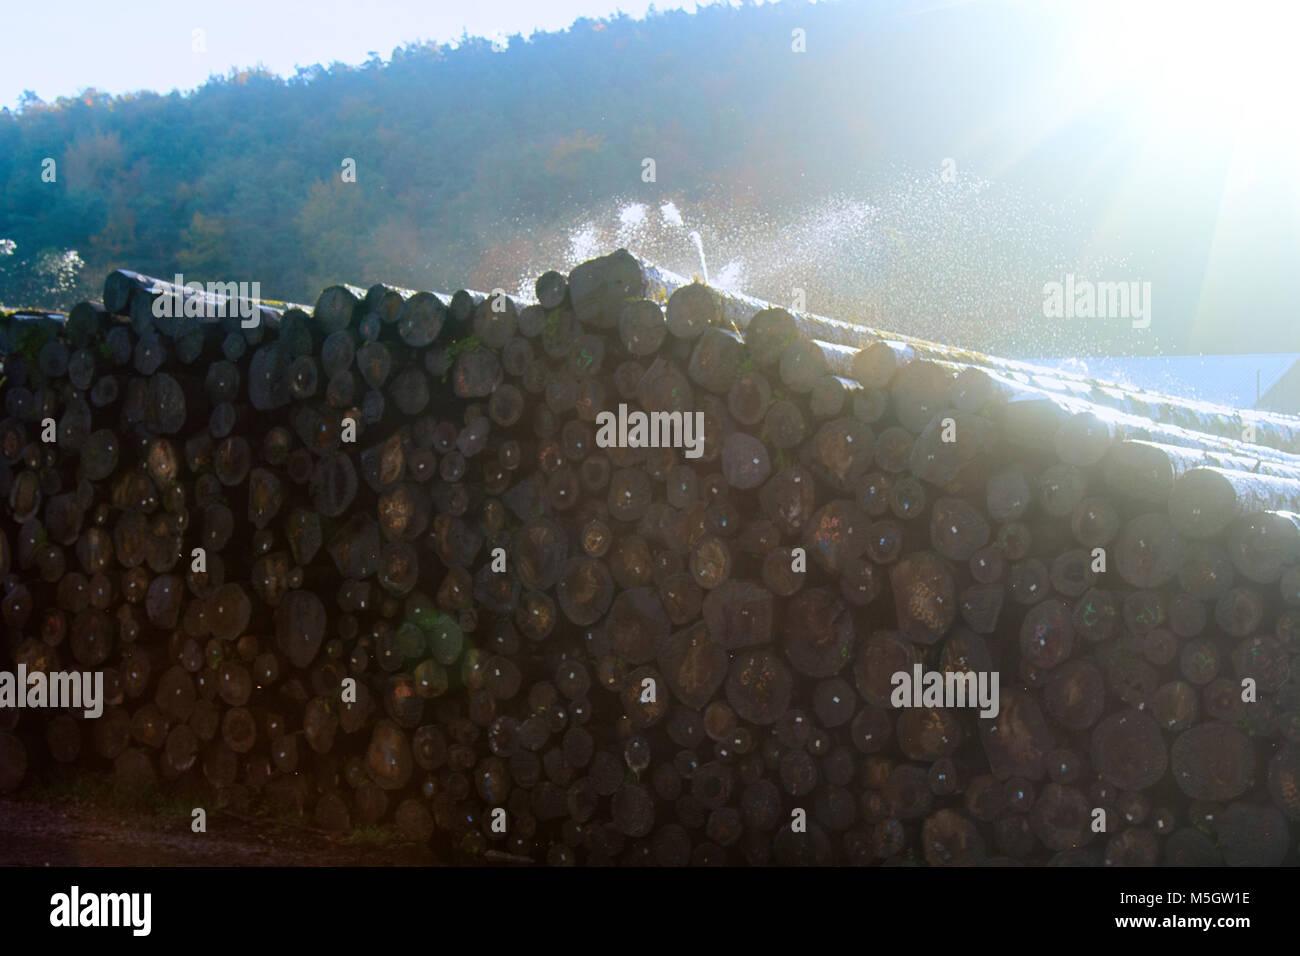 Water pile of logs (stack of logs, log deck). Sprinkler irrigation as way of preserving wood - creating microclimate - Stock Image